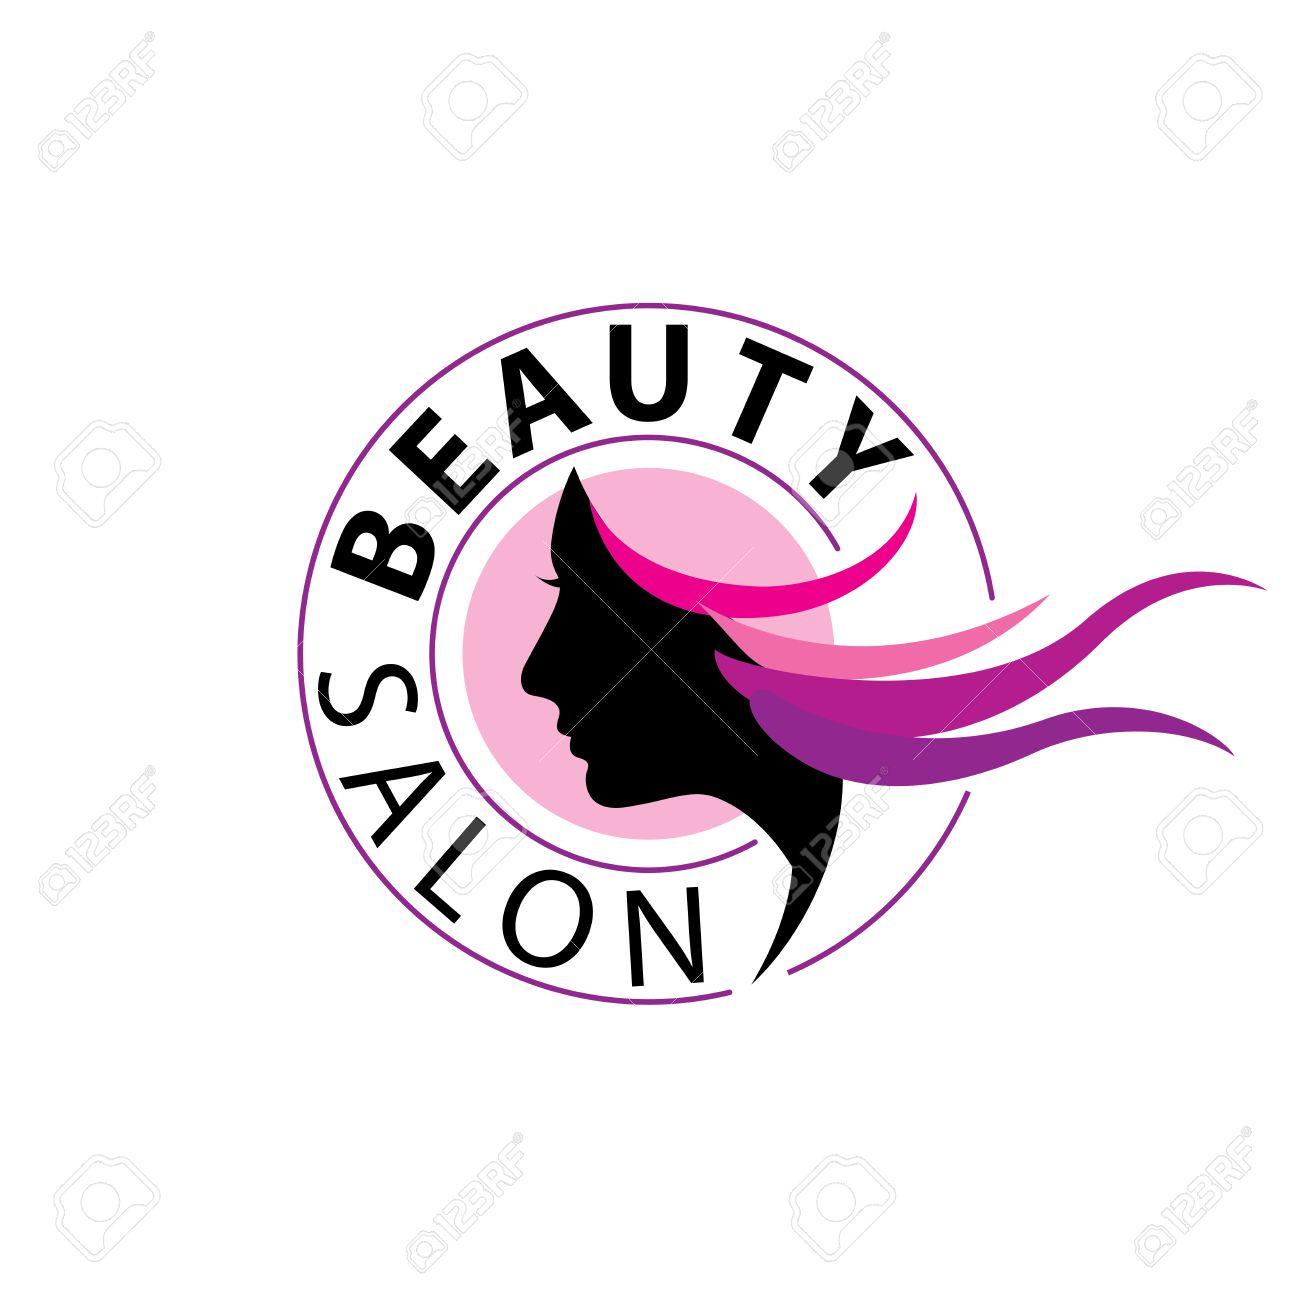 beauty female face logo design cosmetic salon logo design creative rh 123rf com beauty salon logo design free beauty salon logo vector free download